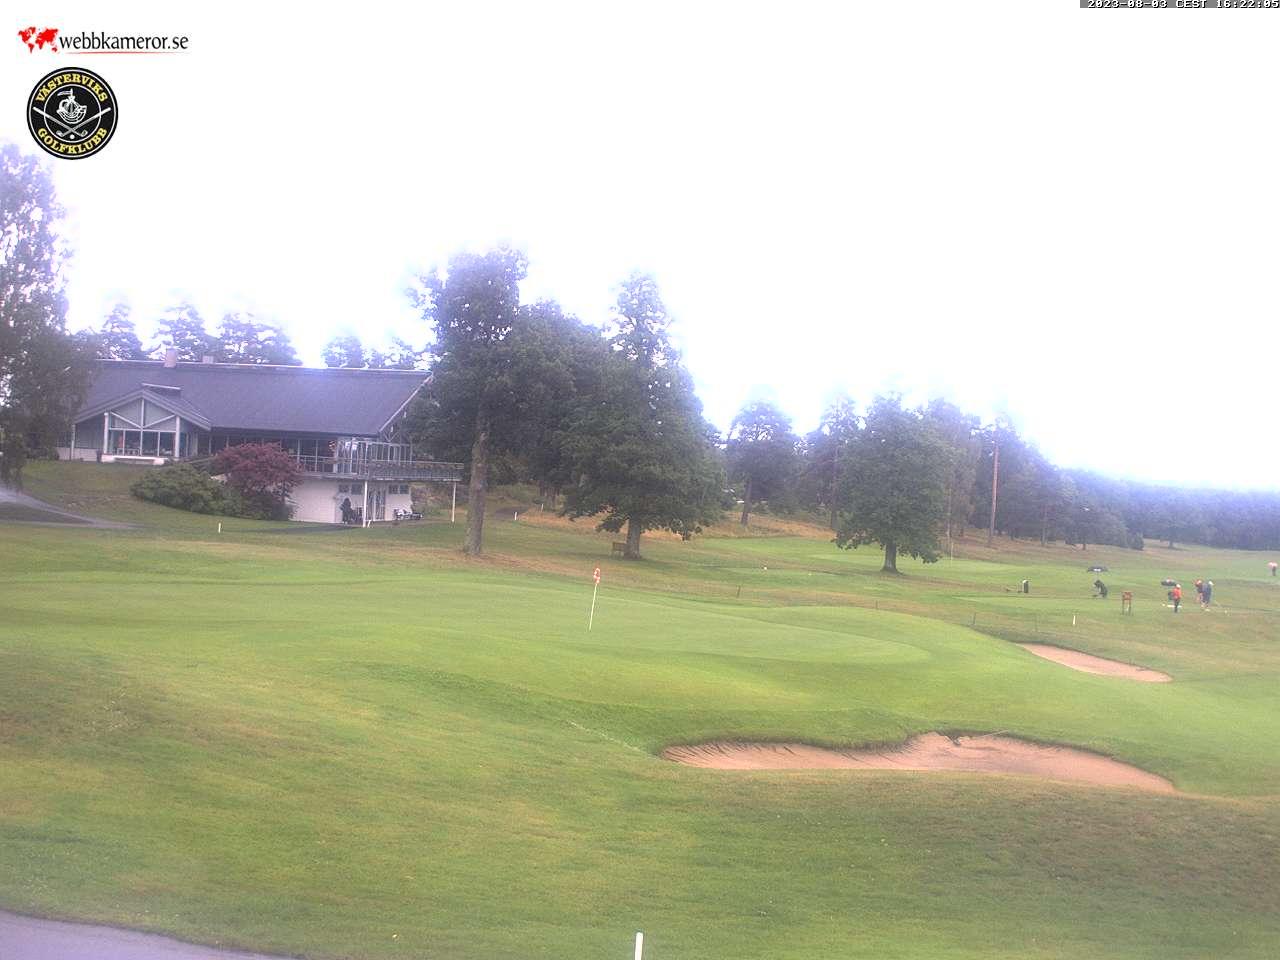 Webkamera i Västervik, Västerviks golfklubb megapixel-storlek